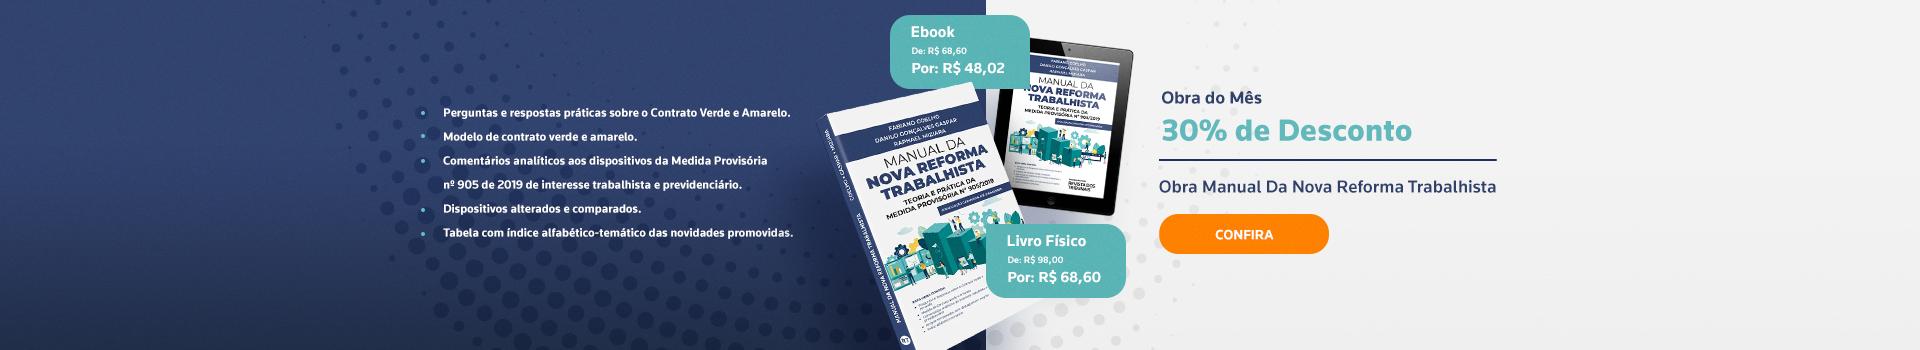 Manual da Nova Reforma Trabalhista